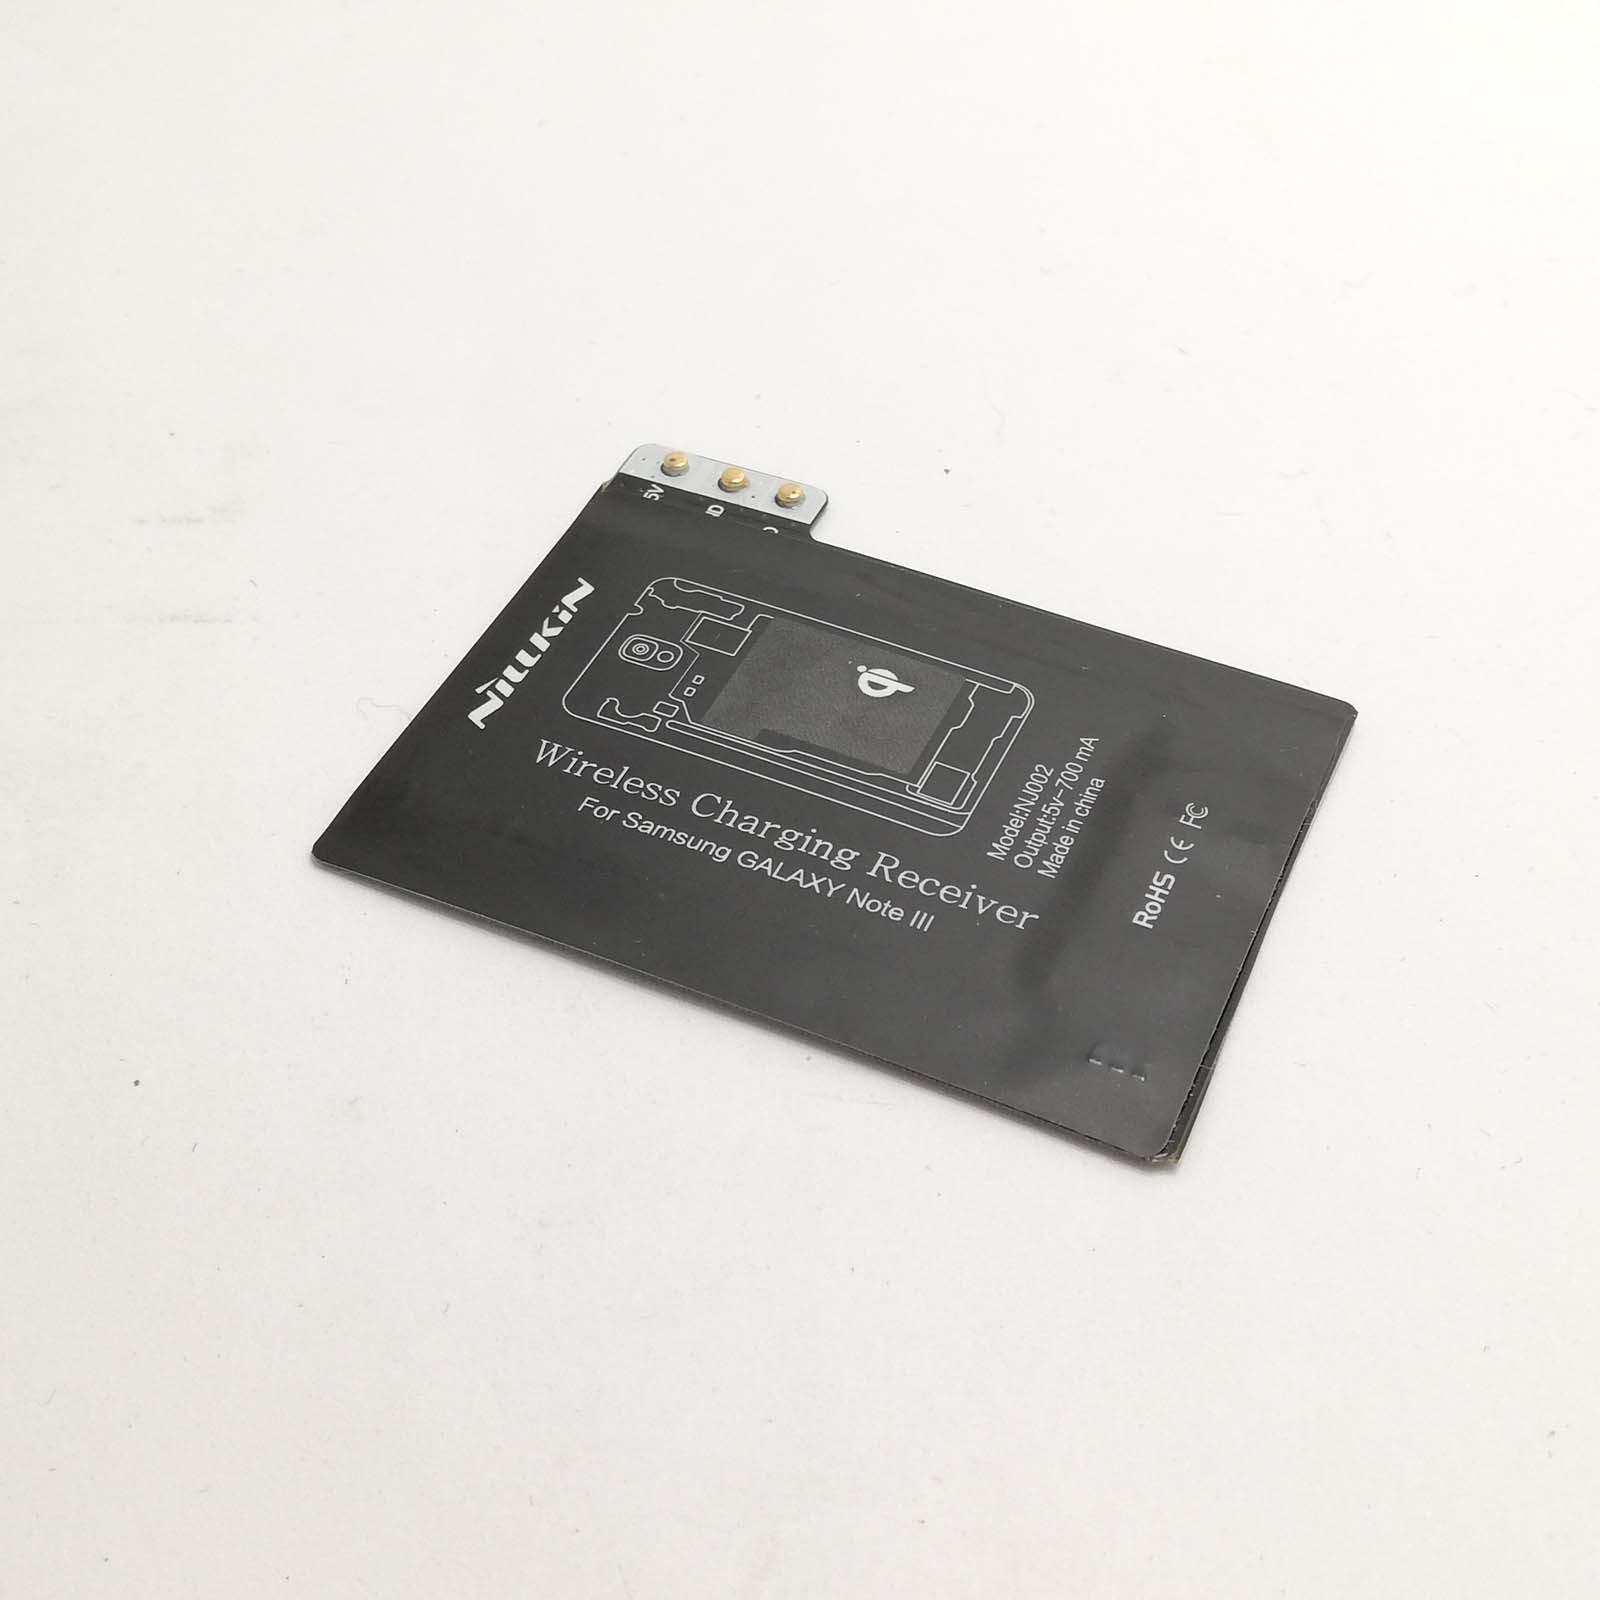 Ricarica Wireless Samsung Galaxy Note 3 N9000